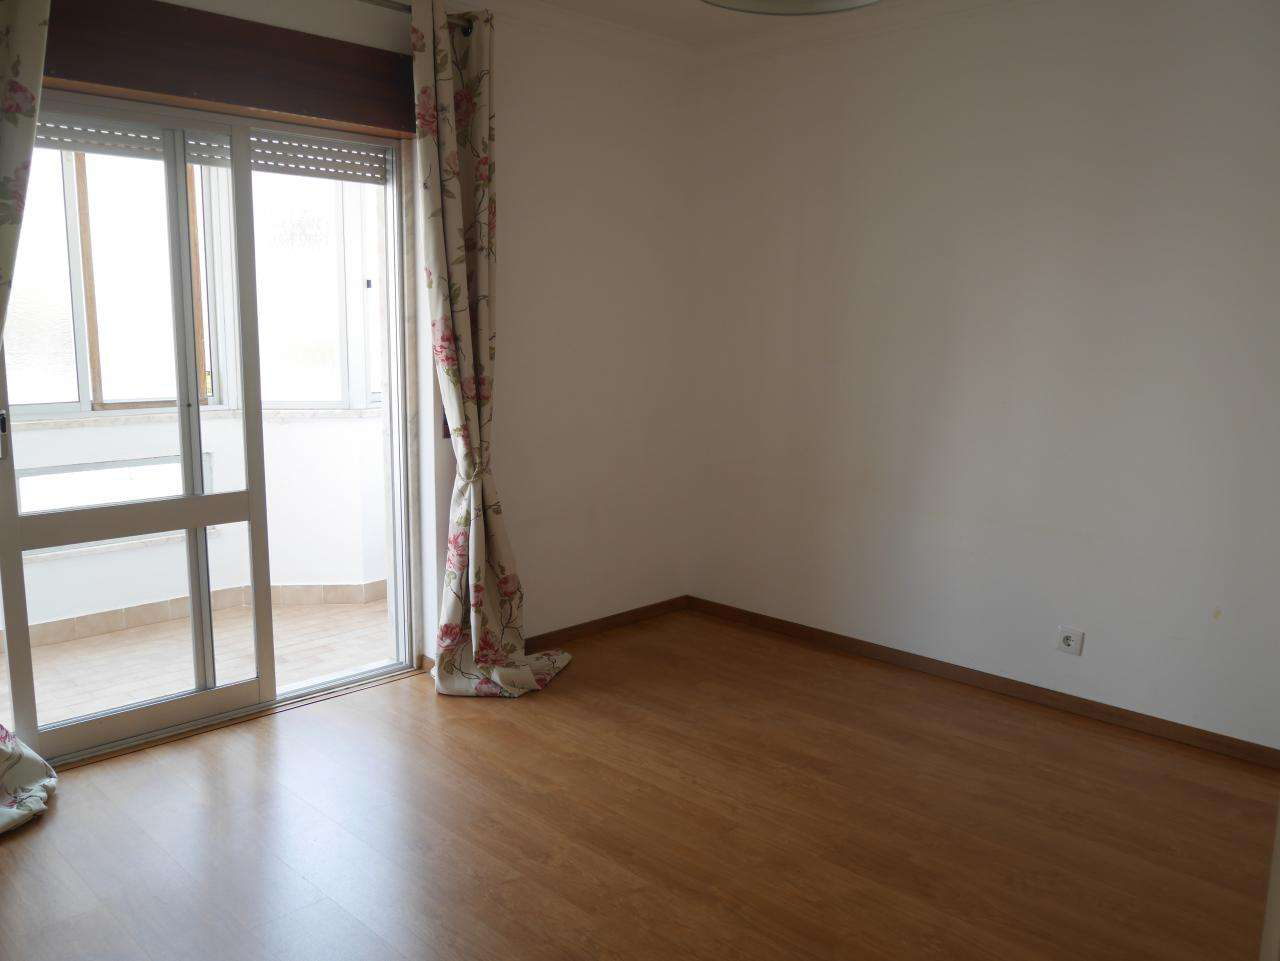 Apartamento para comprar, Carcavelos e Parede, Cascais, Lisboa - Foto 7